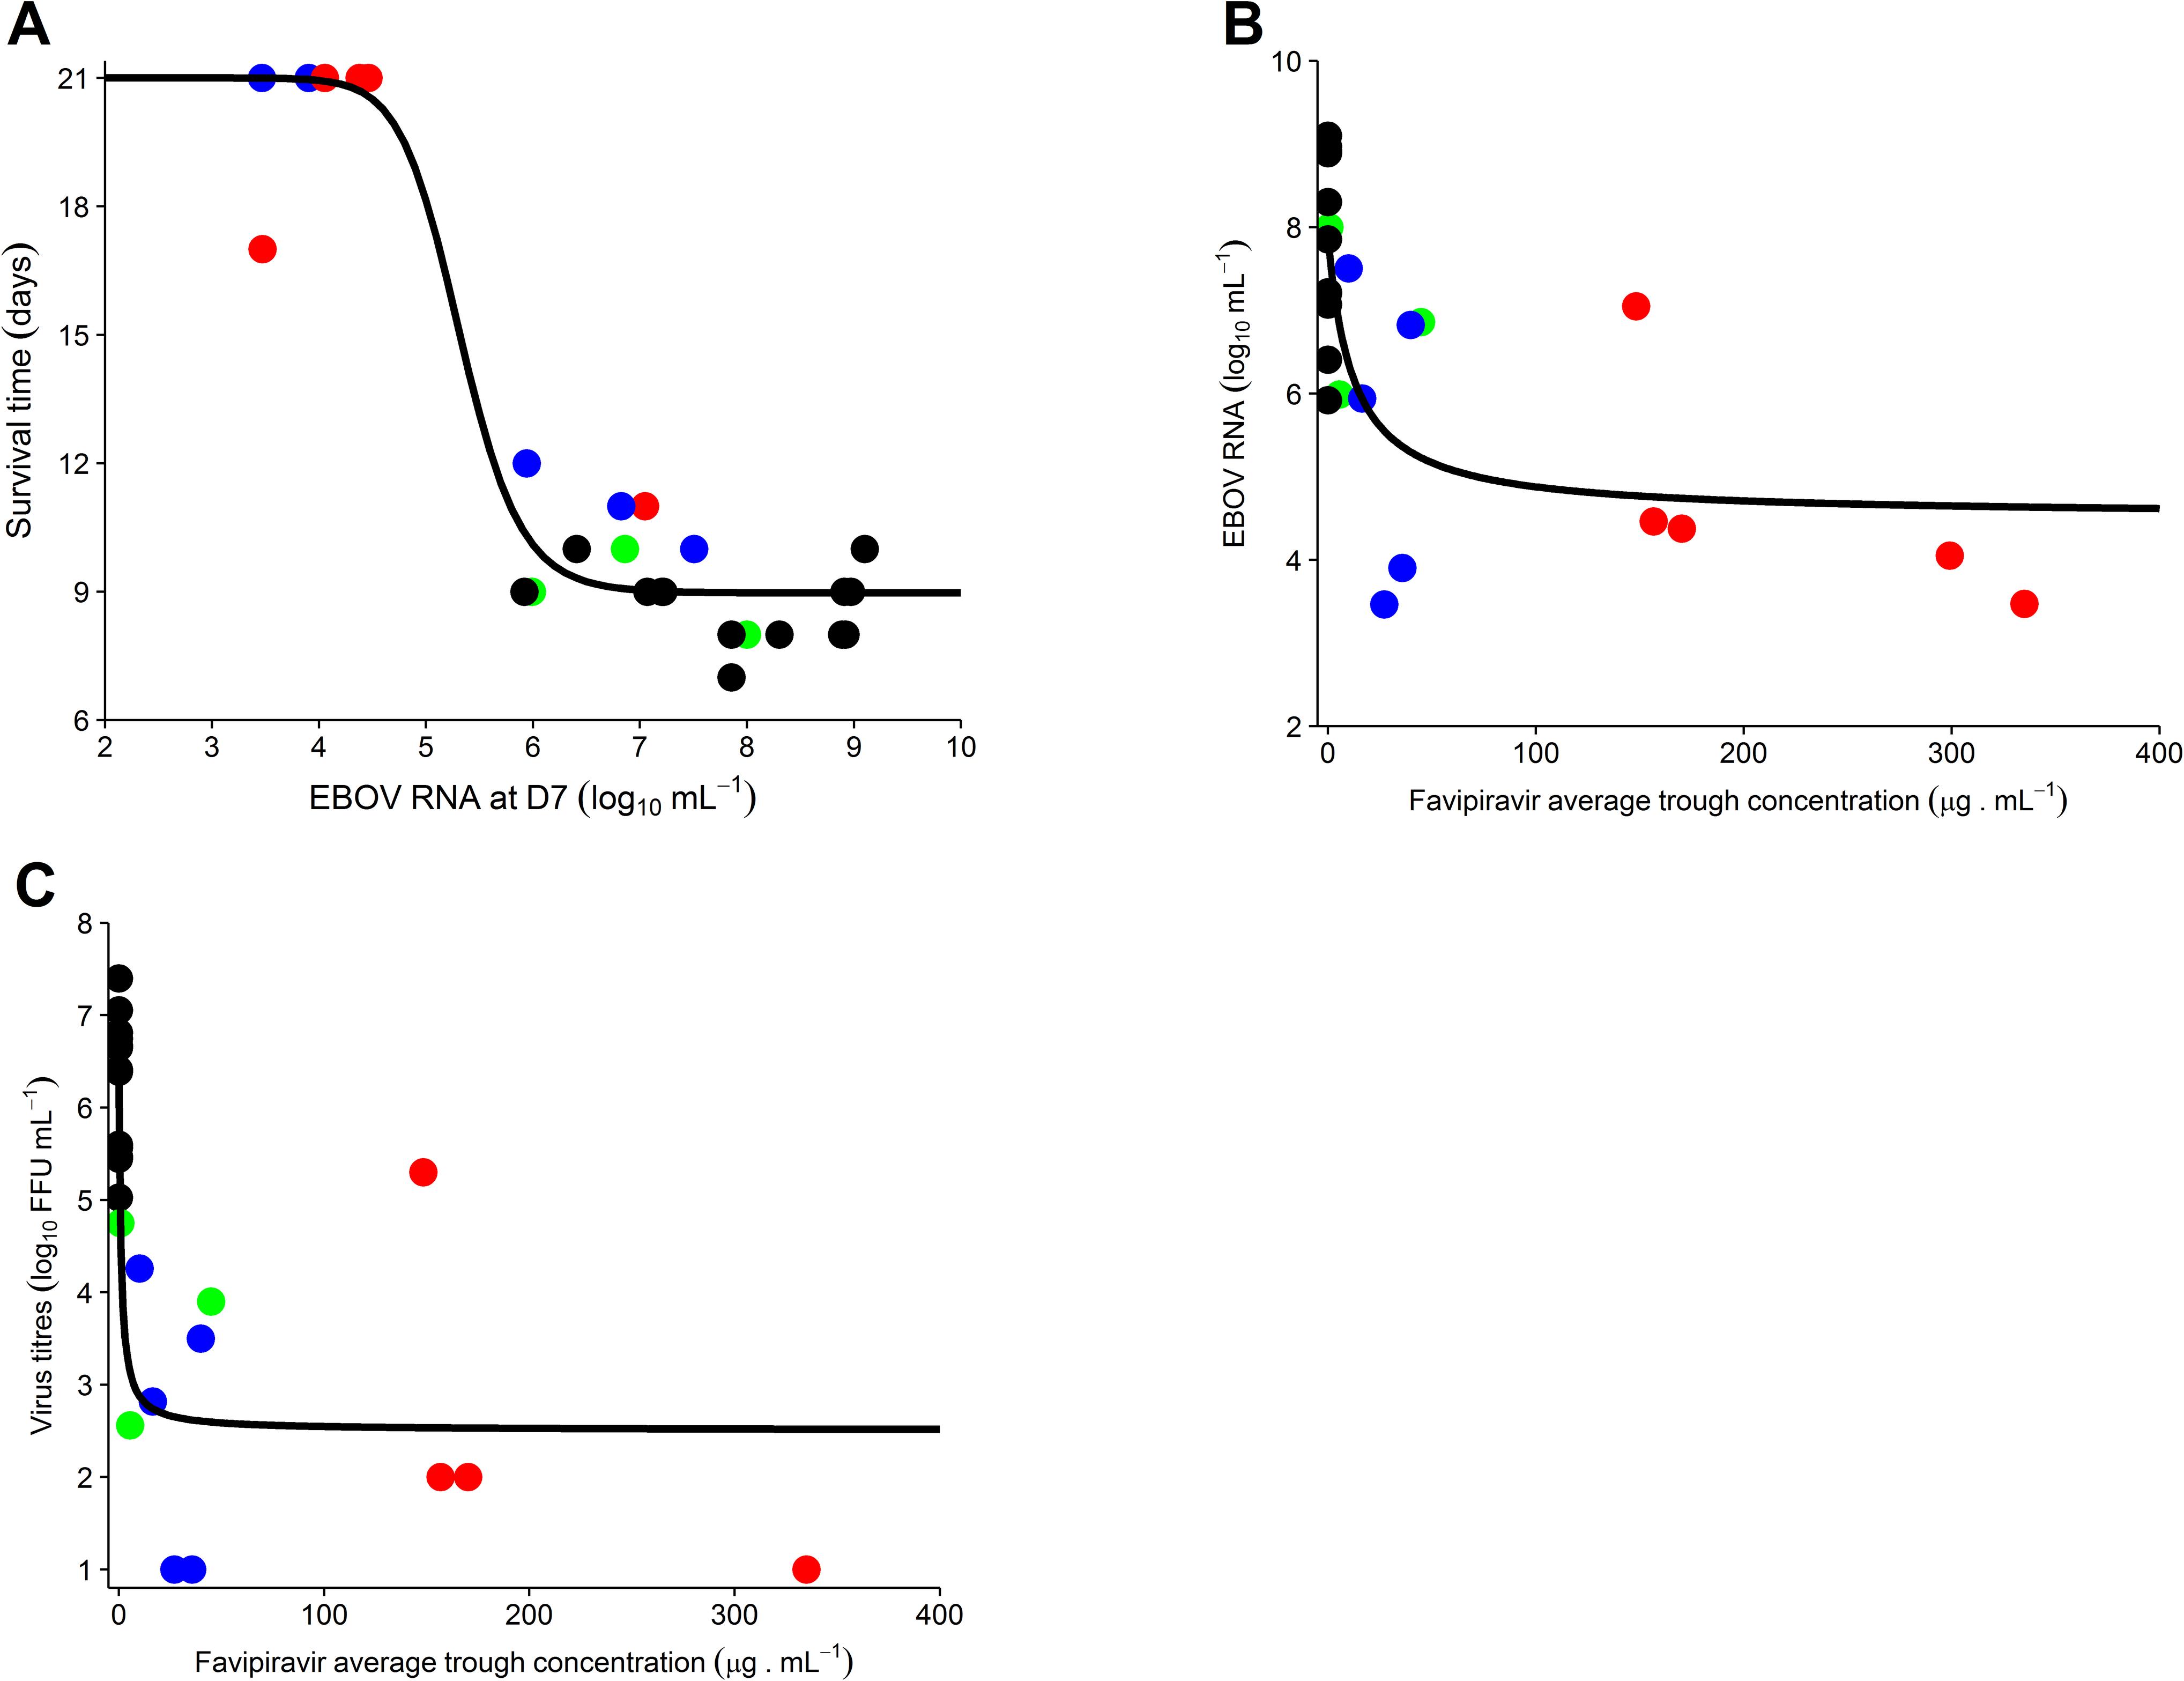 Association between average trough drug concentration until D7 and survival and virological response at D7.